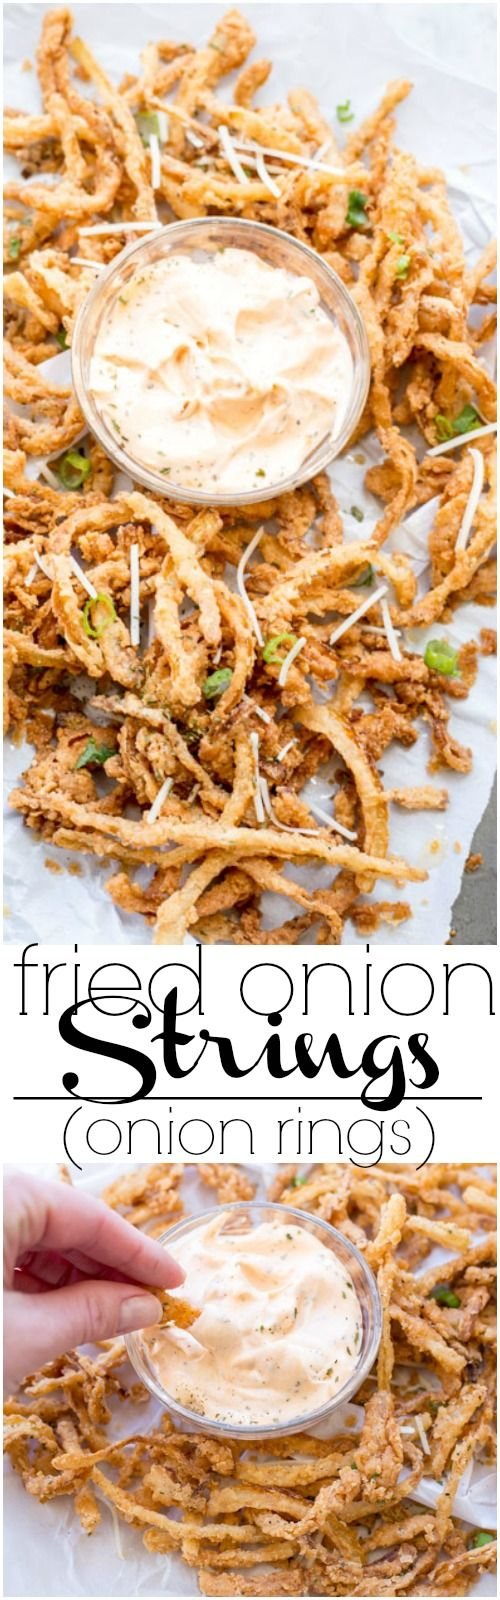 Fried onion strings recipe (onion rings) ValentinasCorner.com